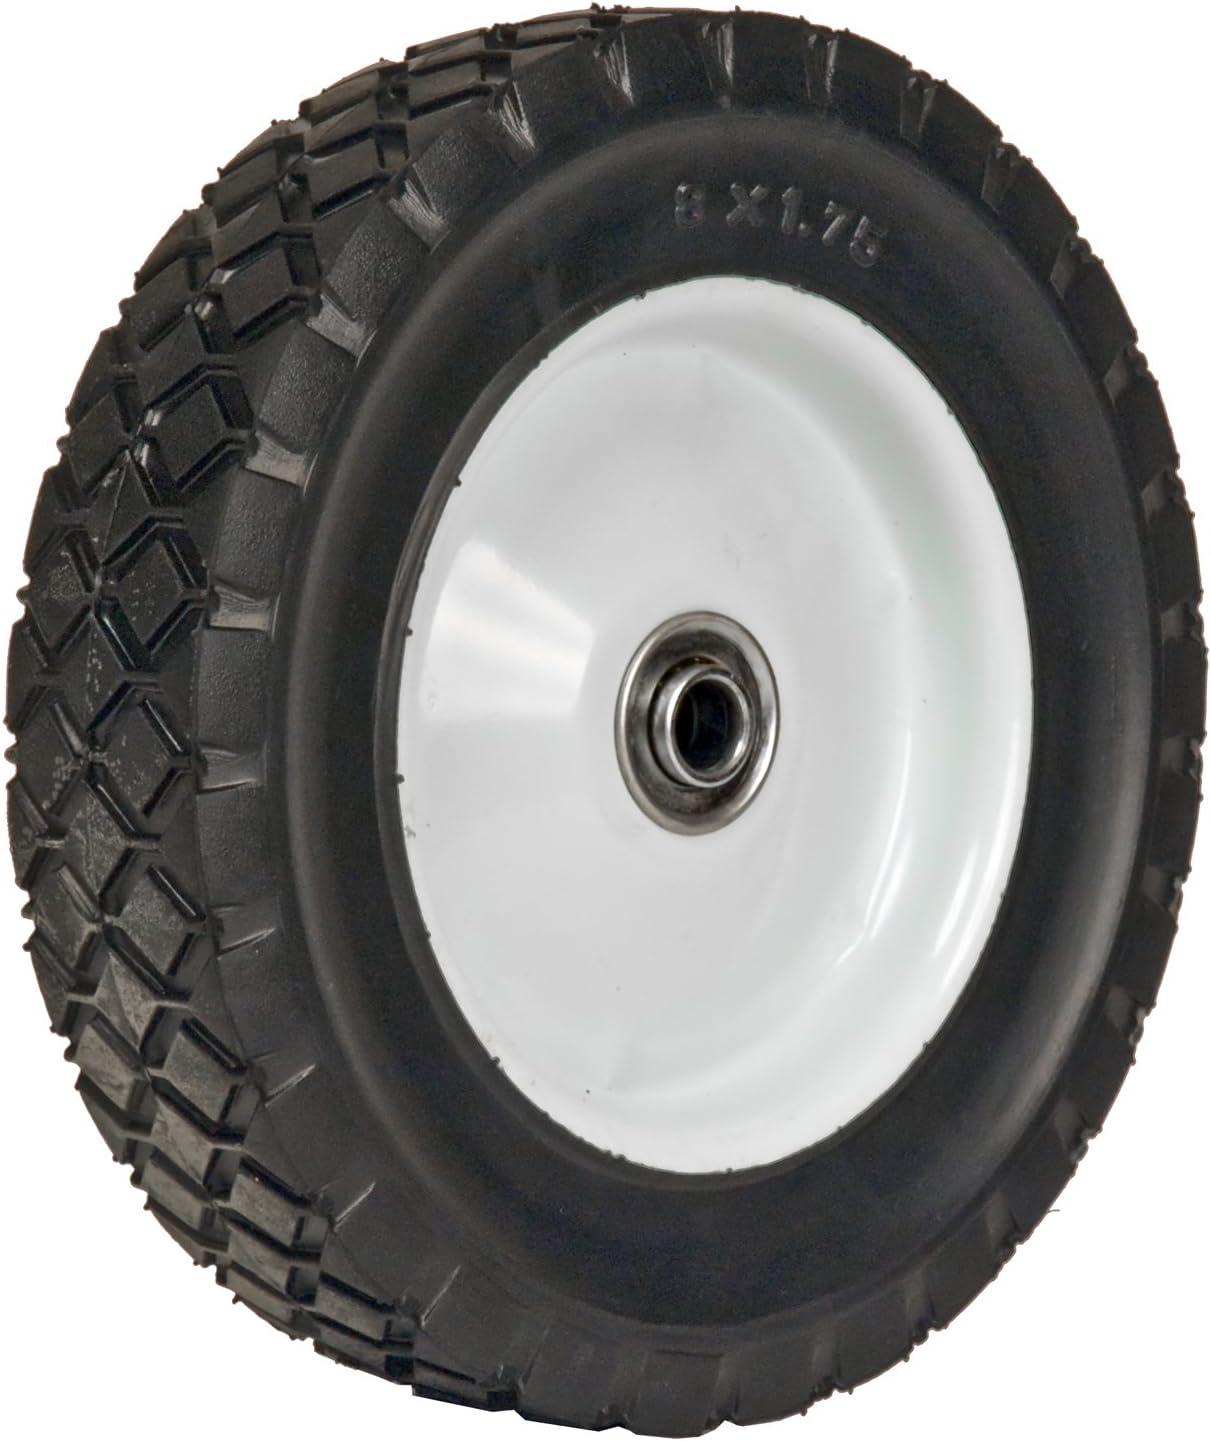 Amazon.com: Martin 875-of 8 por 1.75-inch Light Duty – Rueda ...